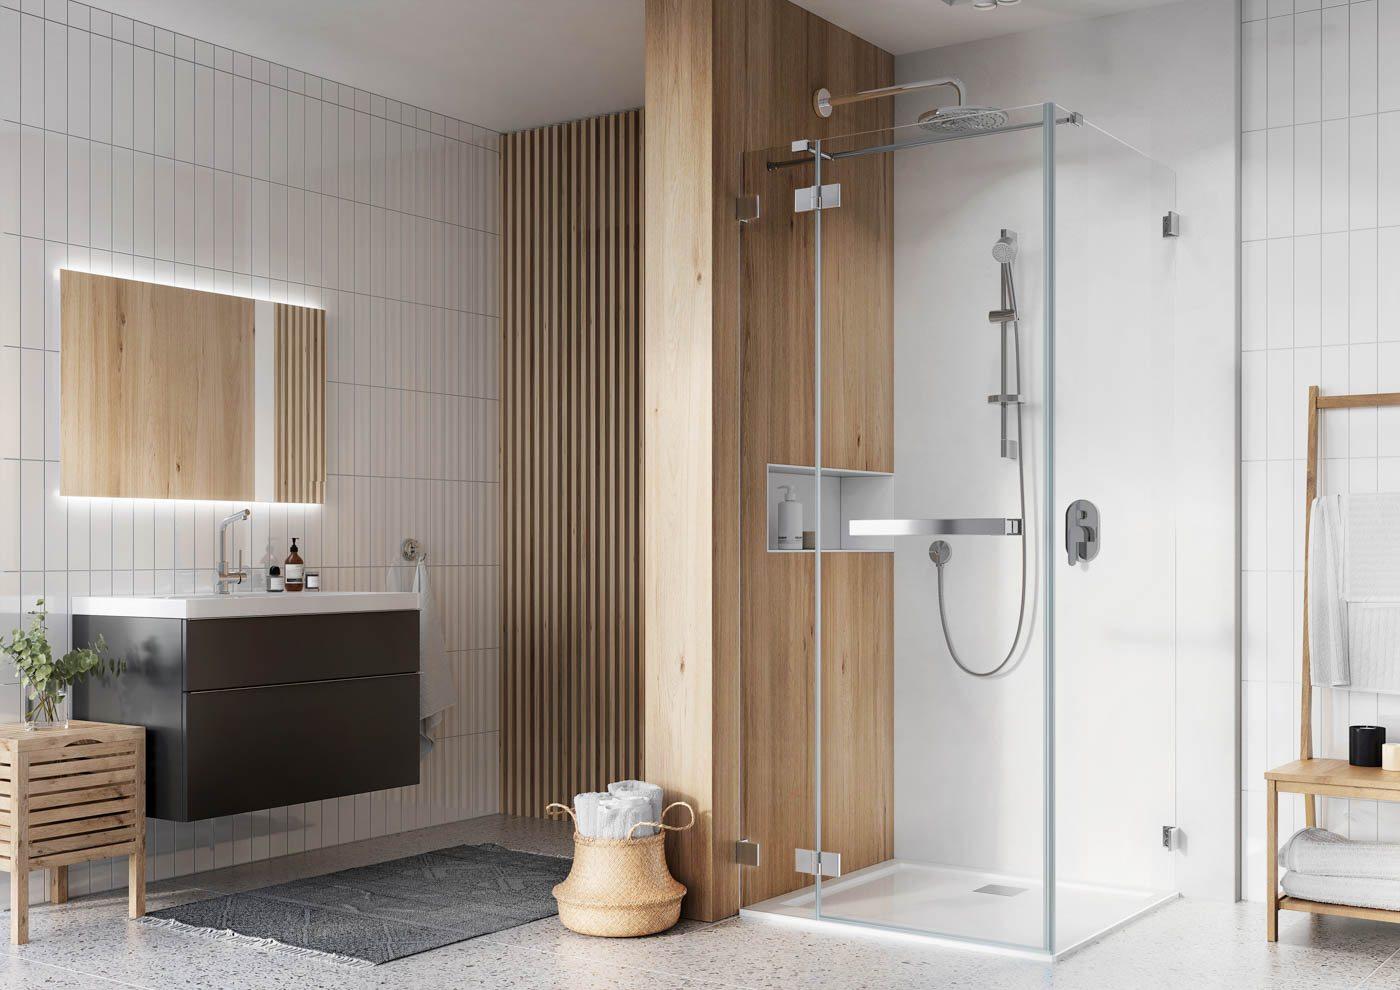 Narożna kabina prysznicowa IMMERSIO marki Aquante